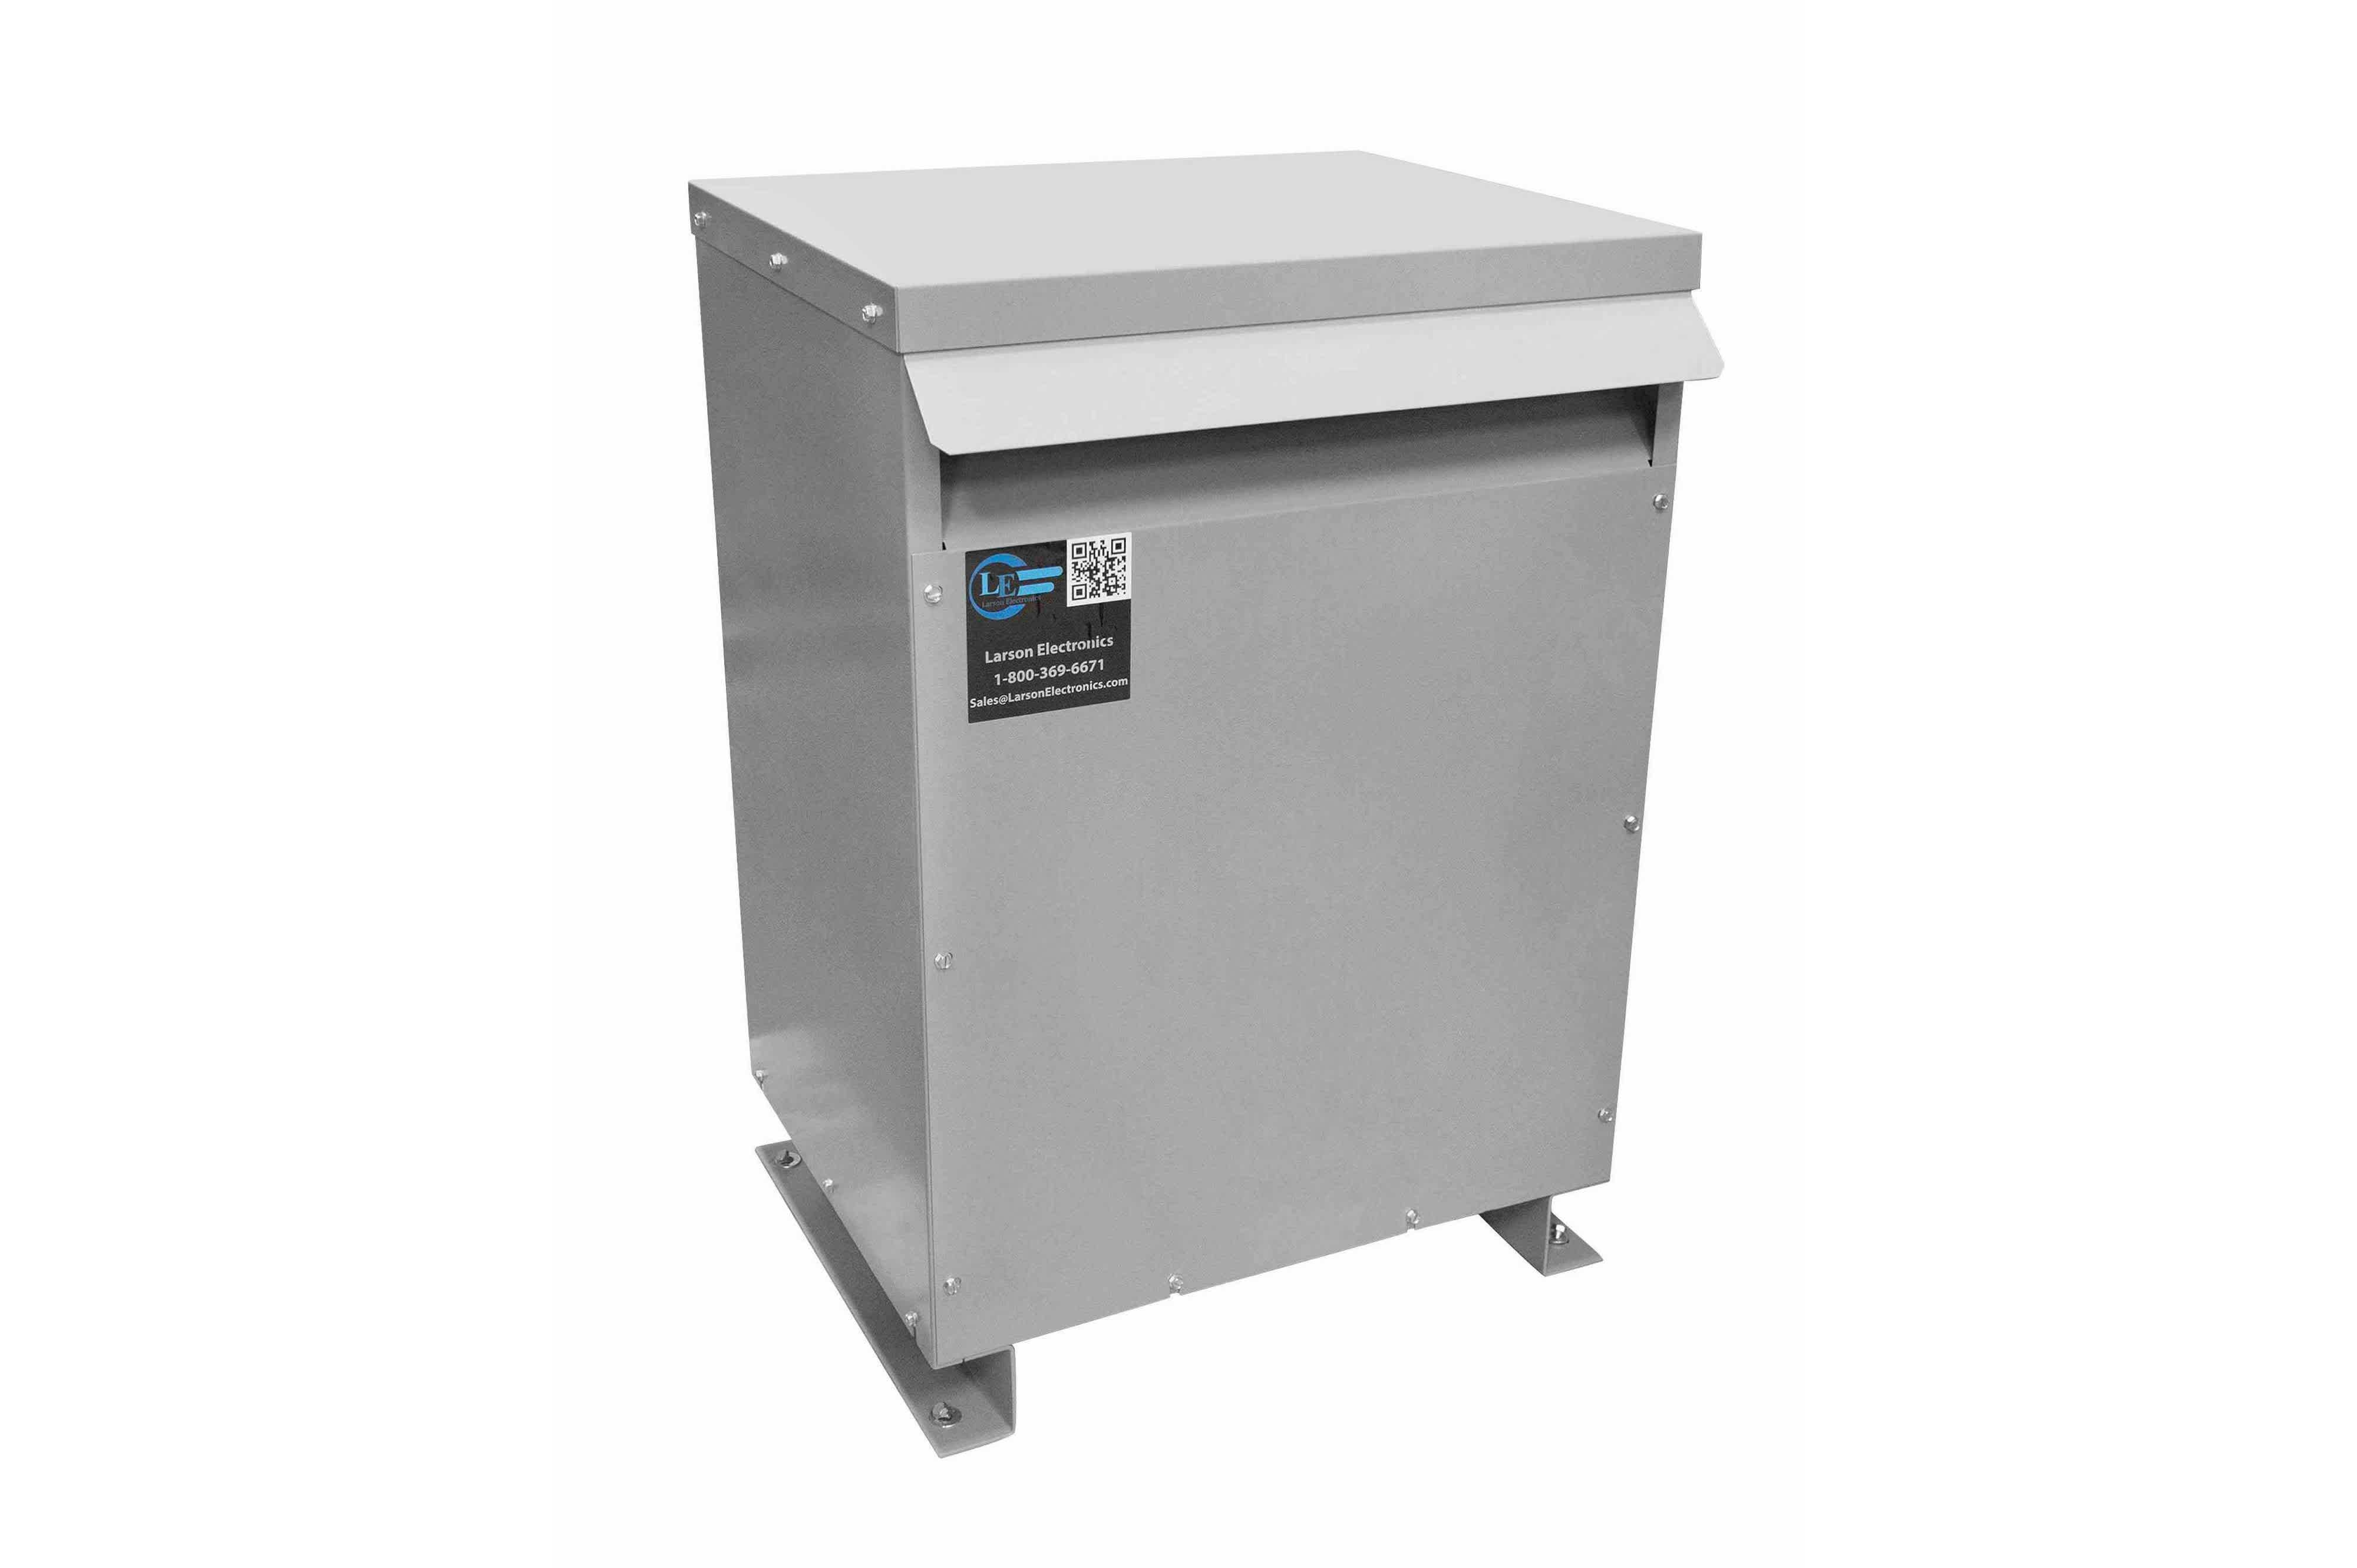 30 kVA 3PH Isolation Transformer, 220V Wye Primary, 480Y/277 Wye-N Secondary, N3R, Ventilated, 60 Hz